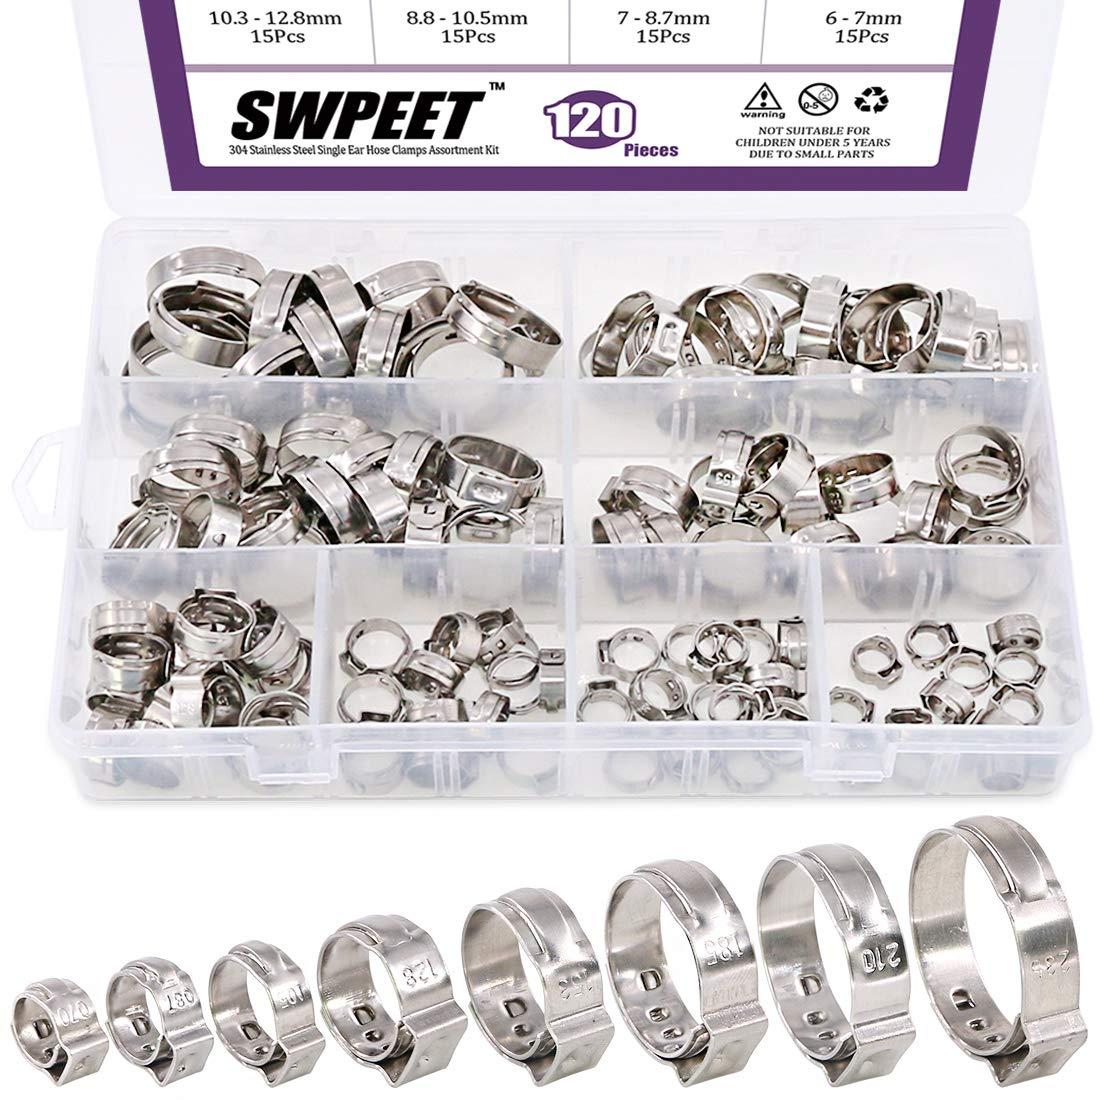 Swpeet 120Pcs 8 Sizes 304 Stainless Steel Single